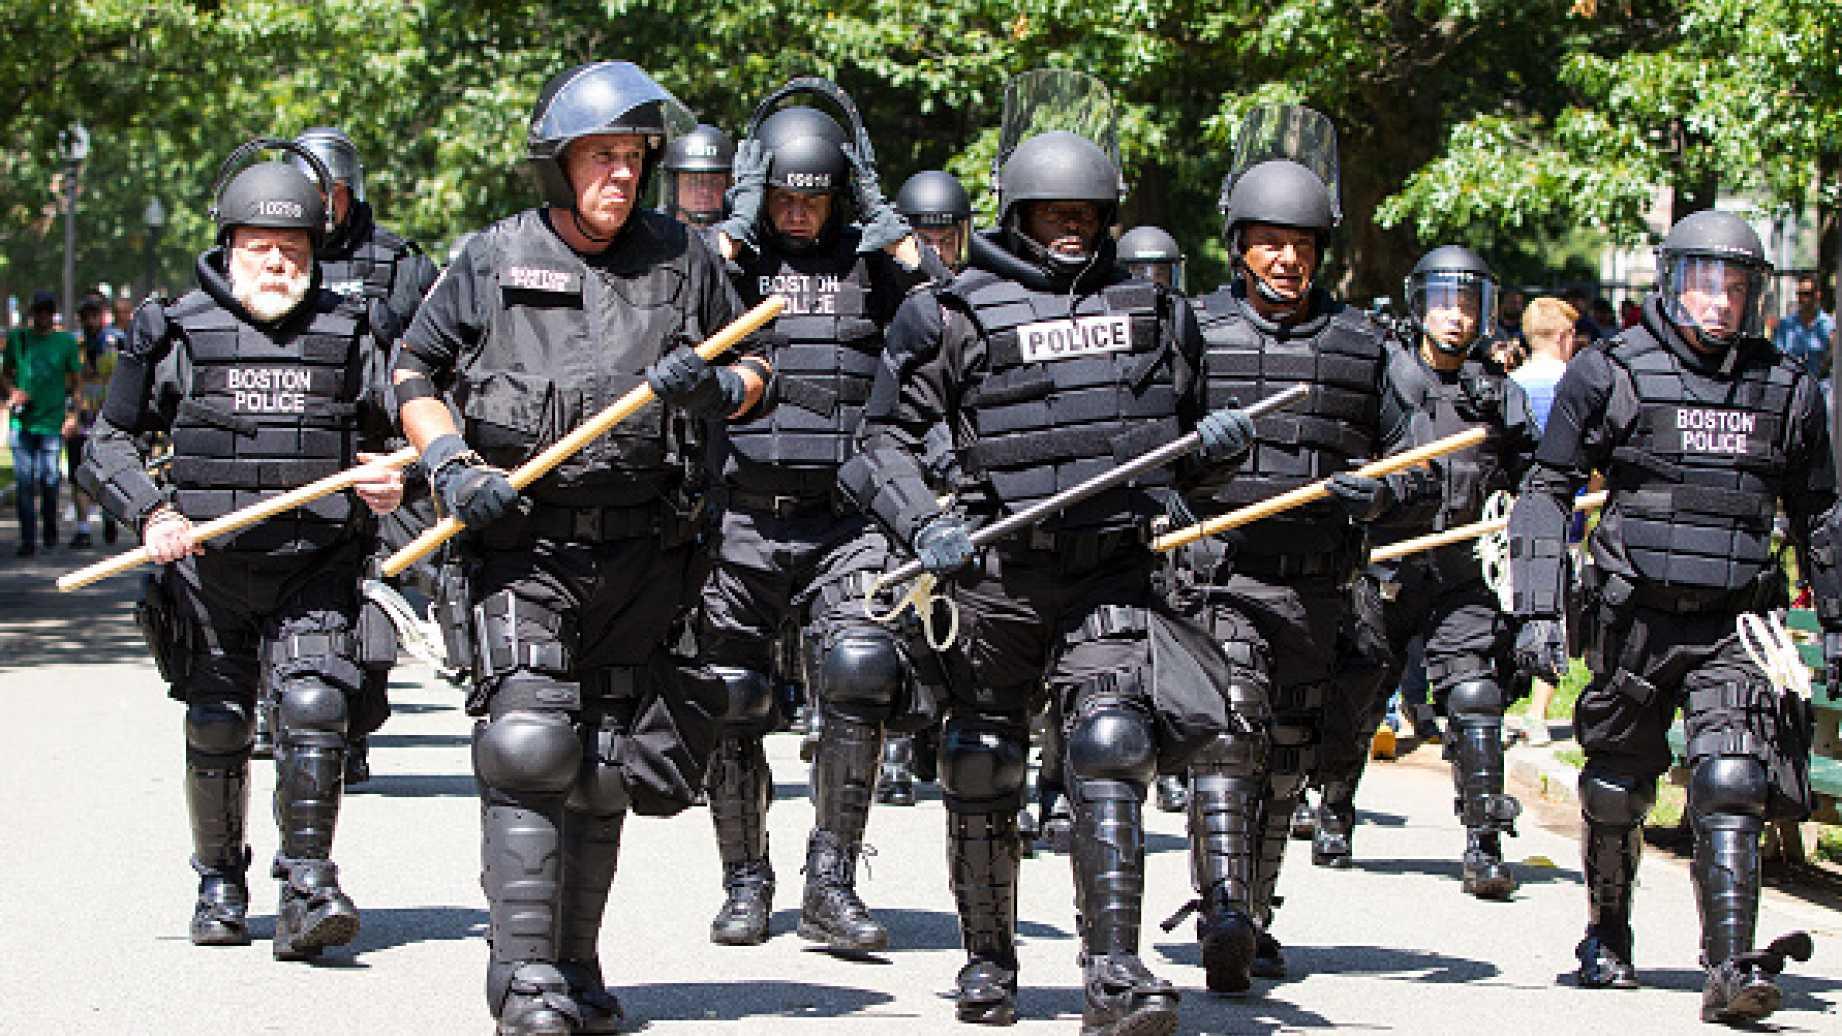 Militarized police in riot gear